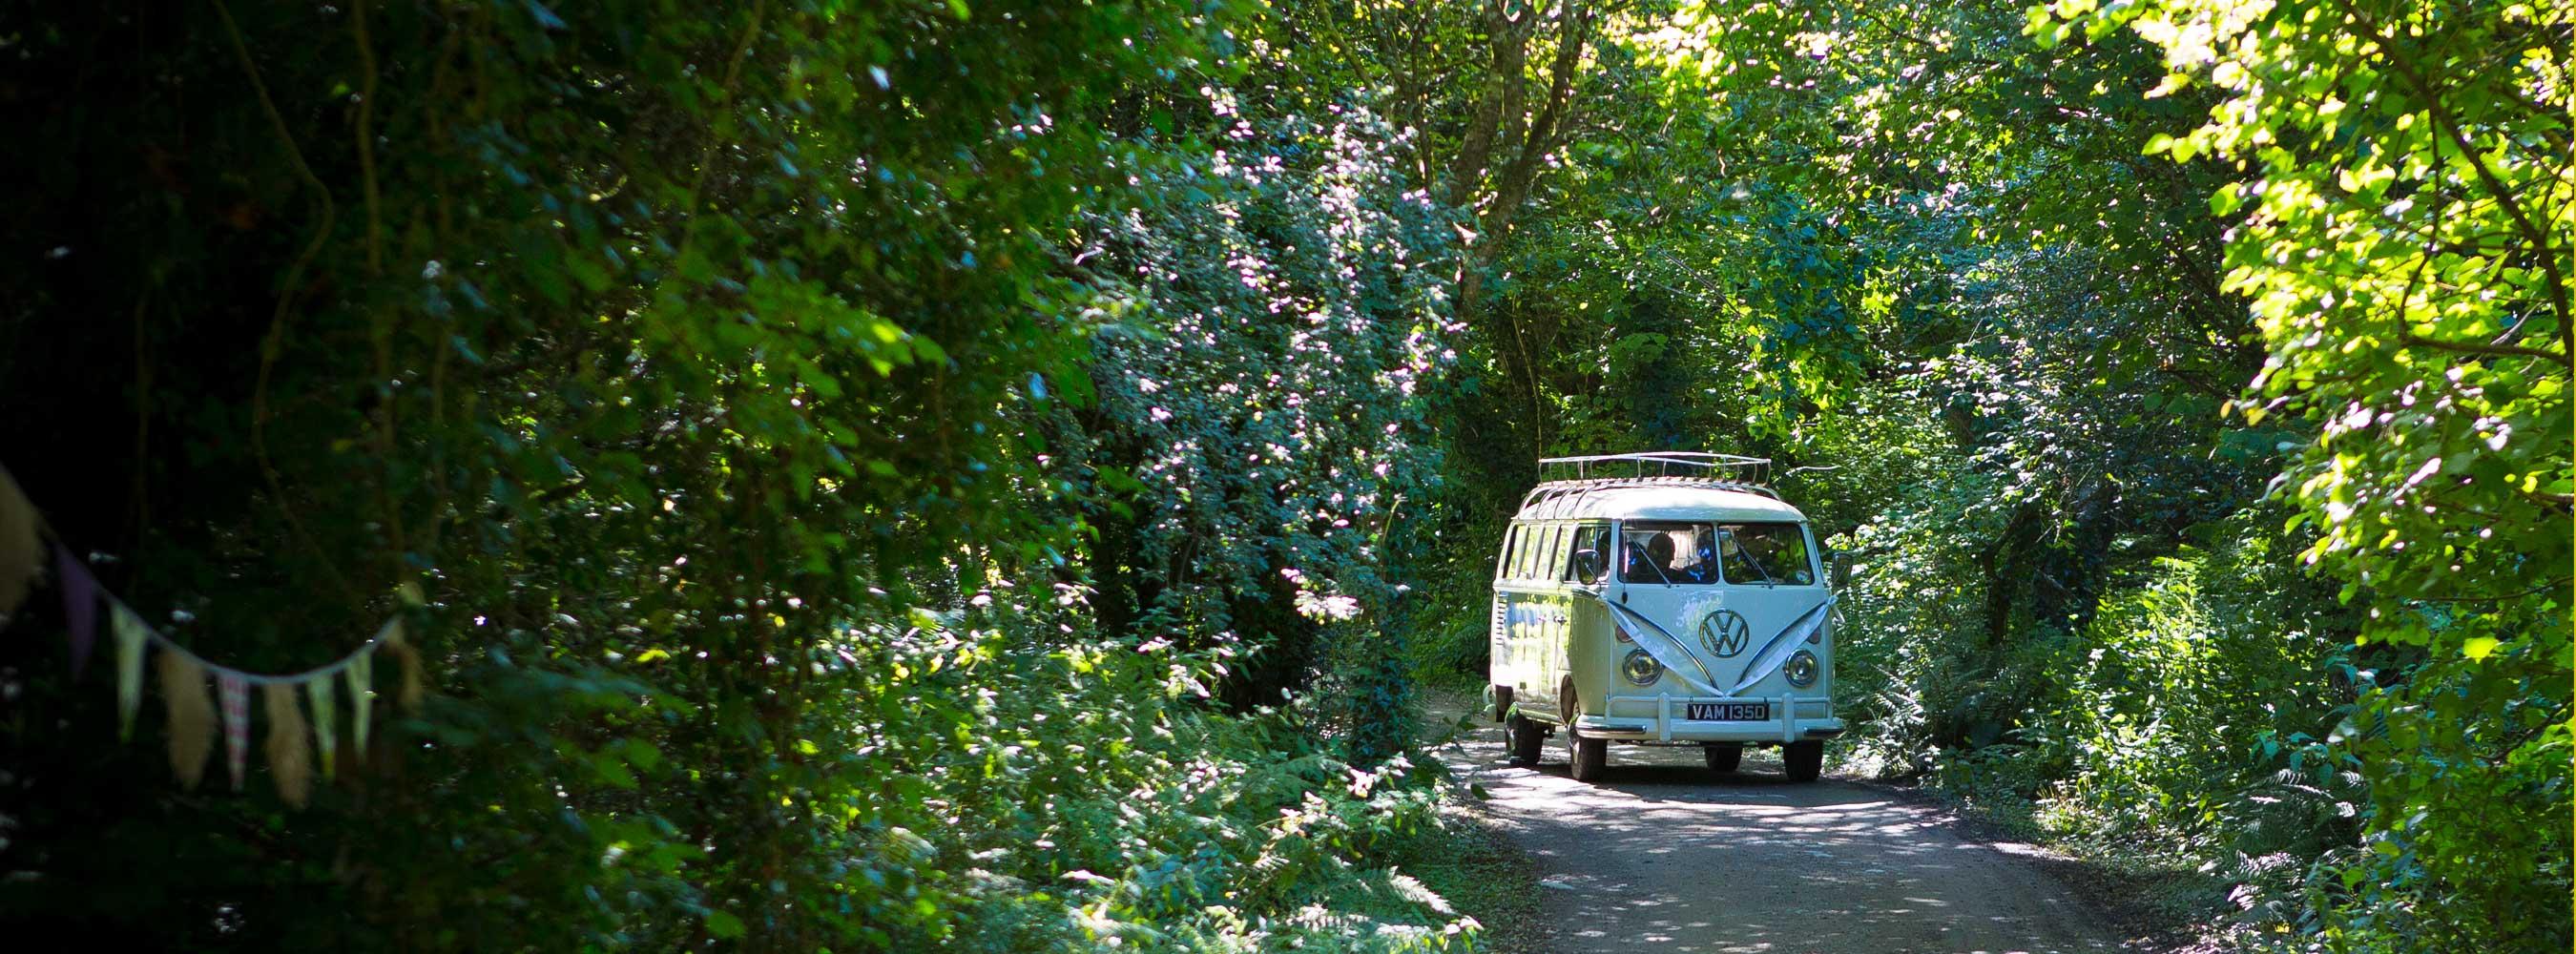 Camper Van Arrival in Woods